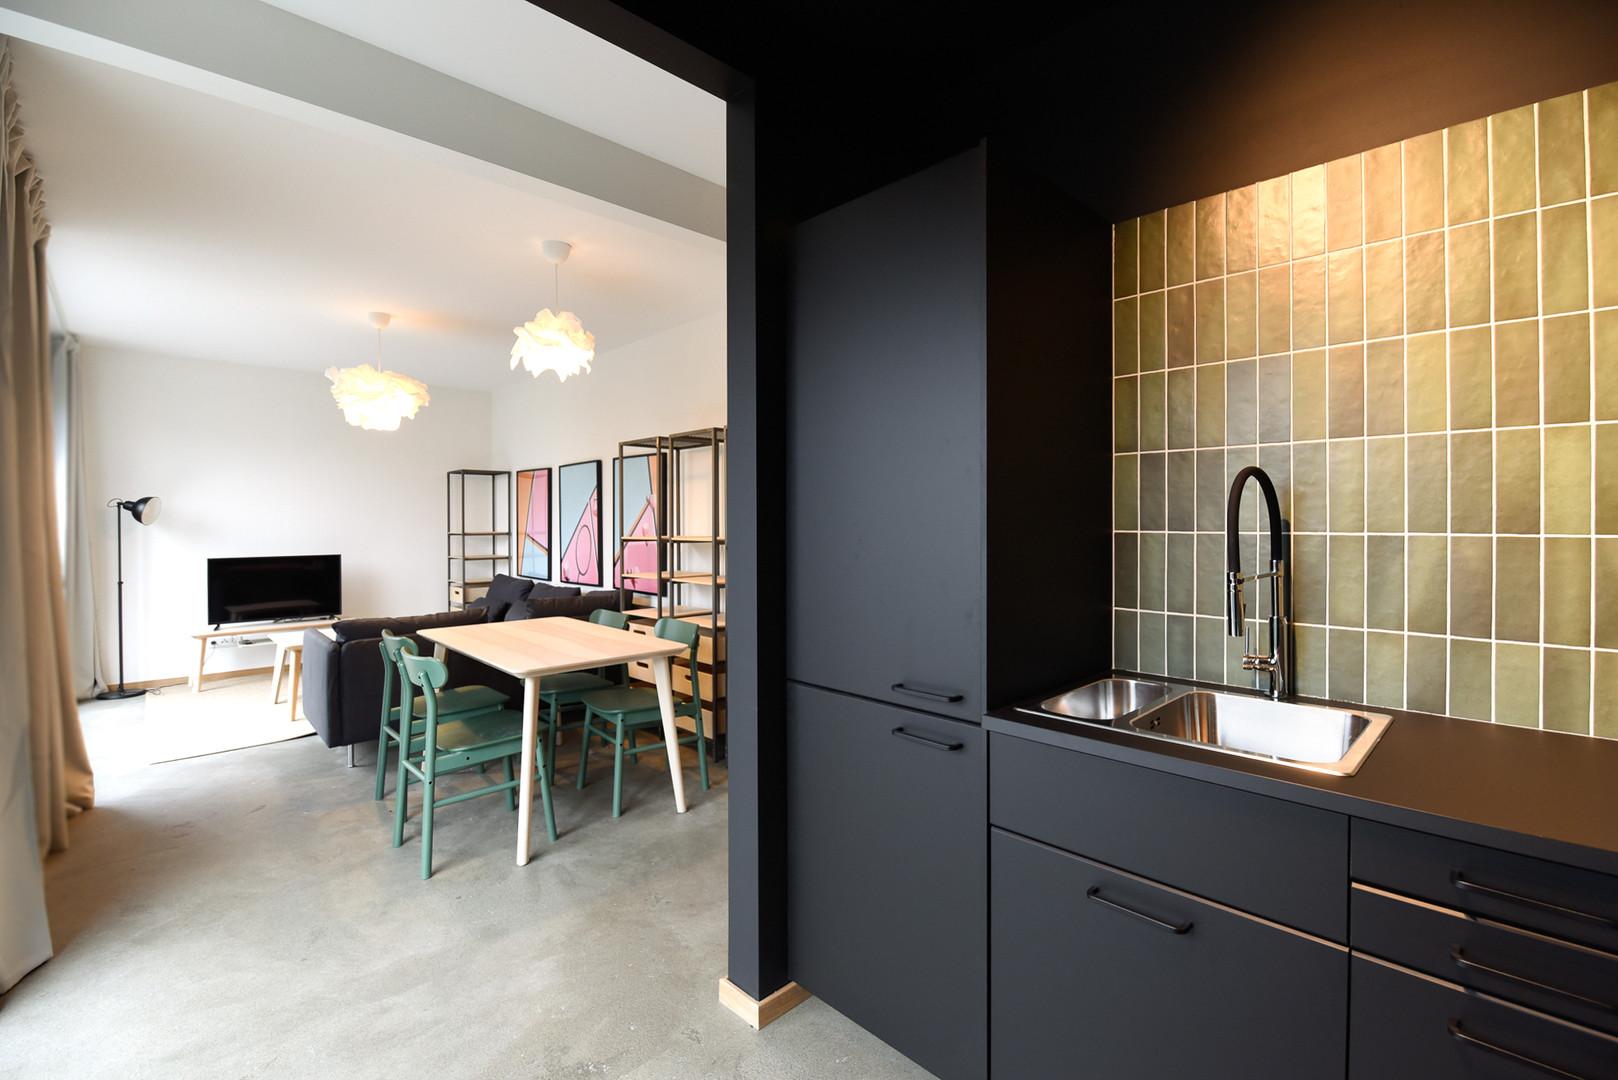 Poznan Marcelin flat for rent_6.jpg